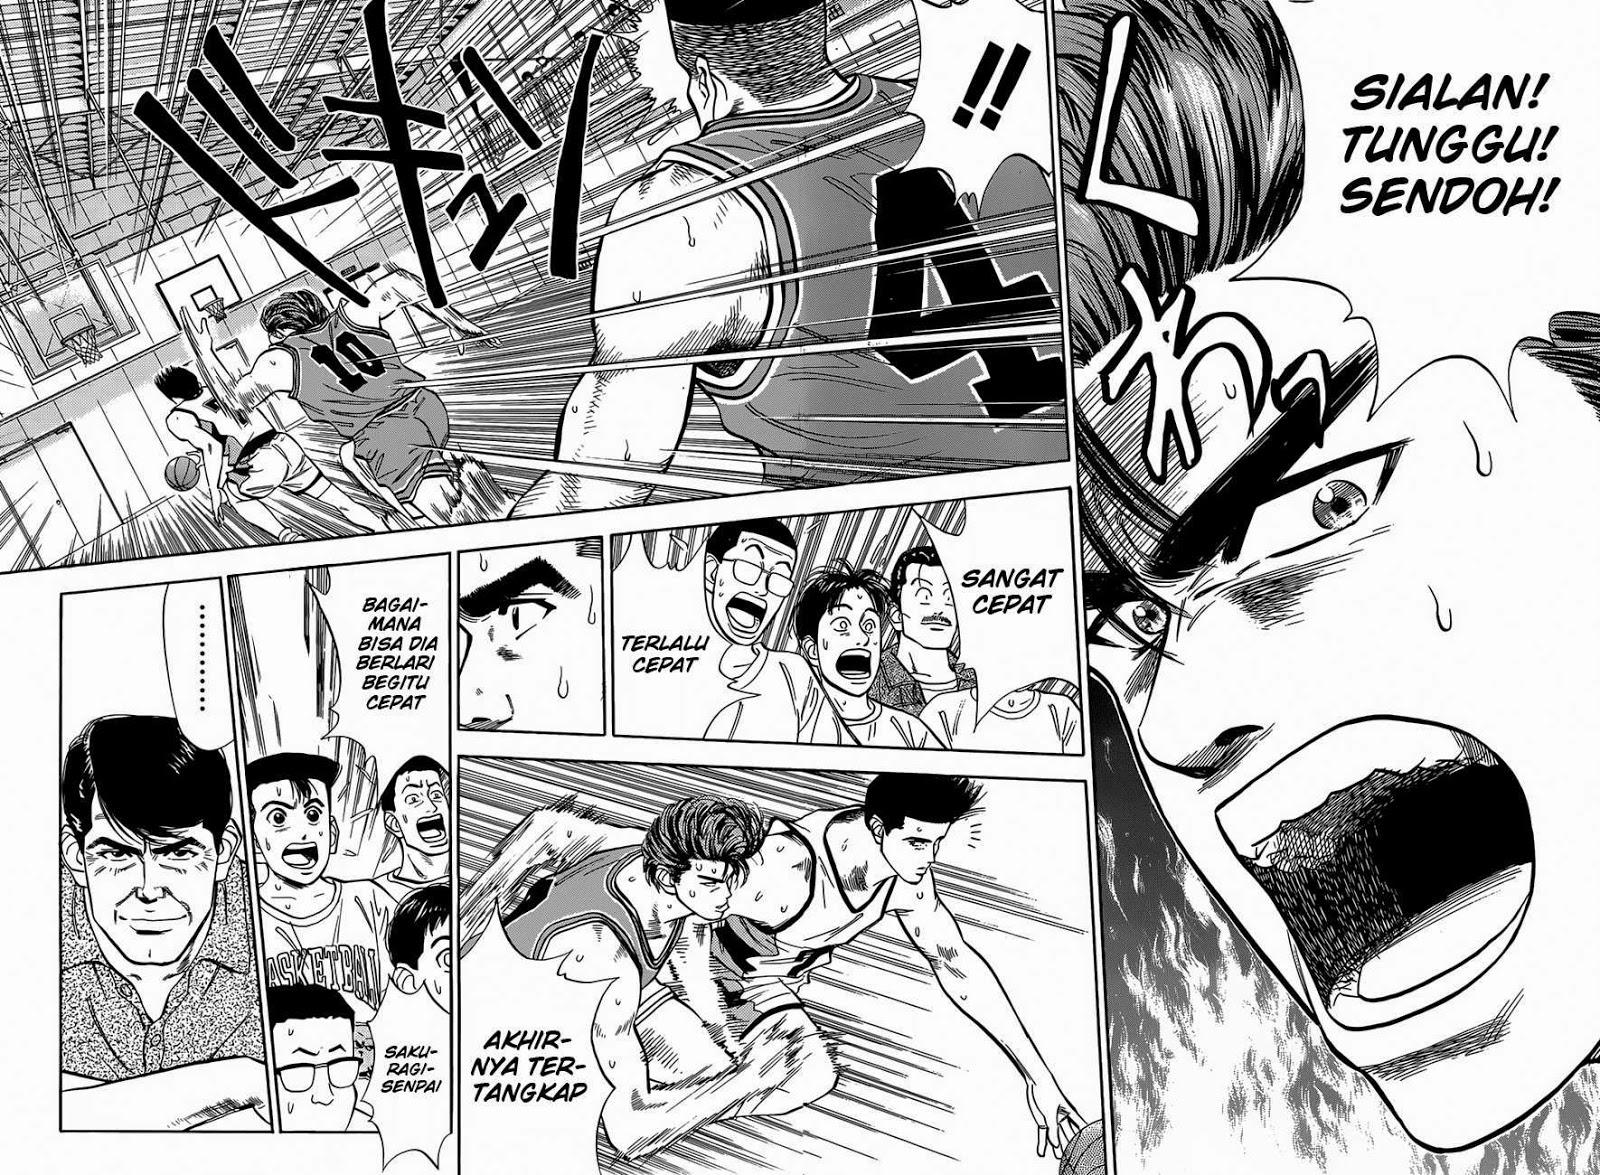 Komik slam dunk 042 - jika ingin menang jangan pernah berhenti 43 Indonesia slam dunk 042 - jika ingin menang jangan pernah berhenti Terbaru 9|Baca Manga Komik Indonesia|